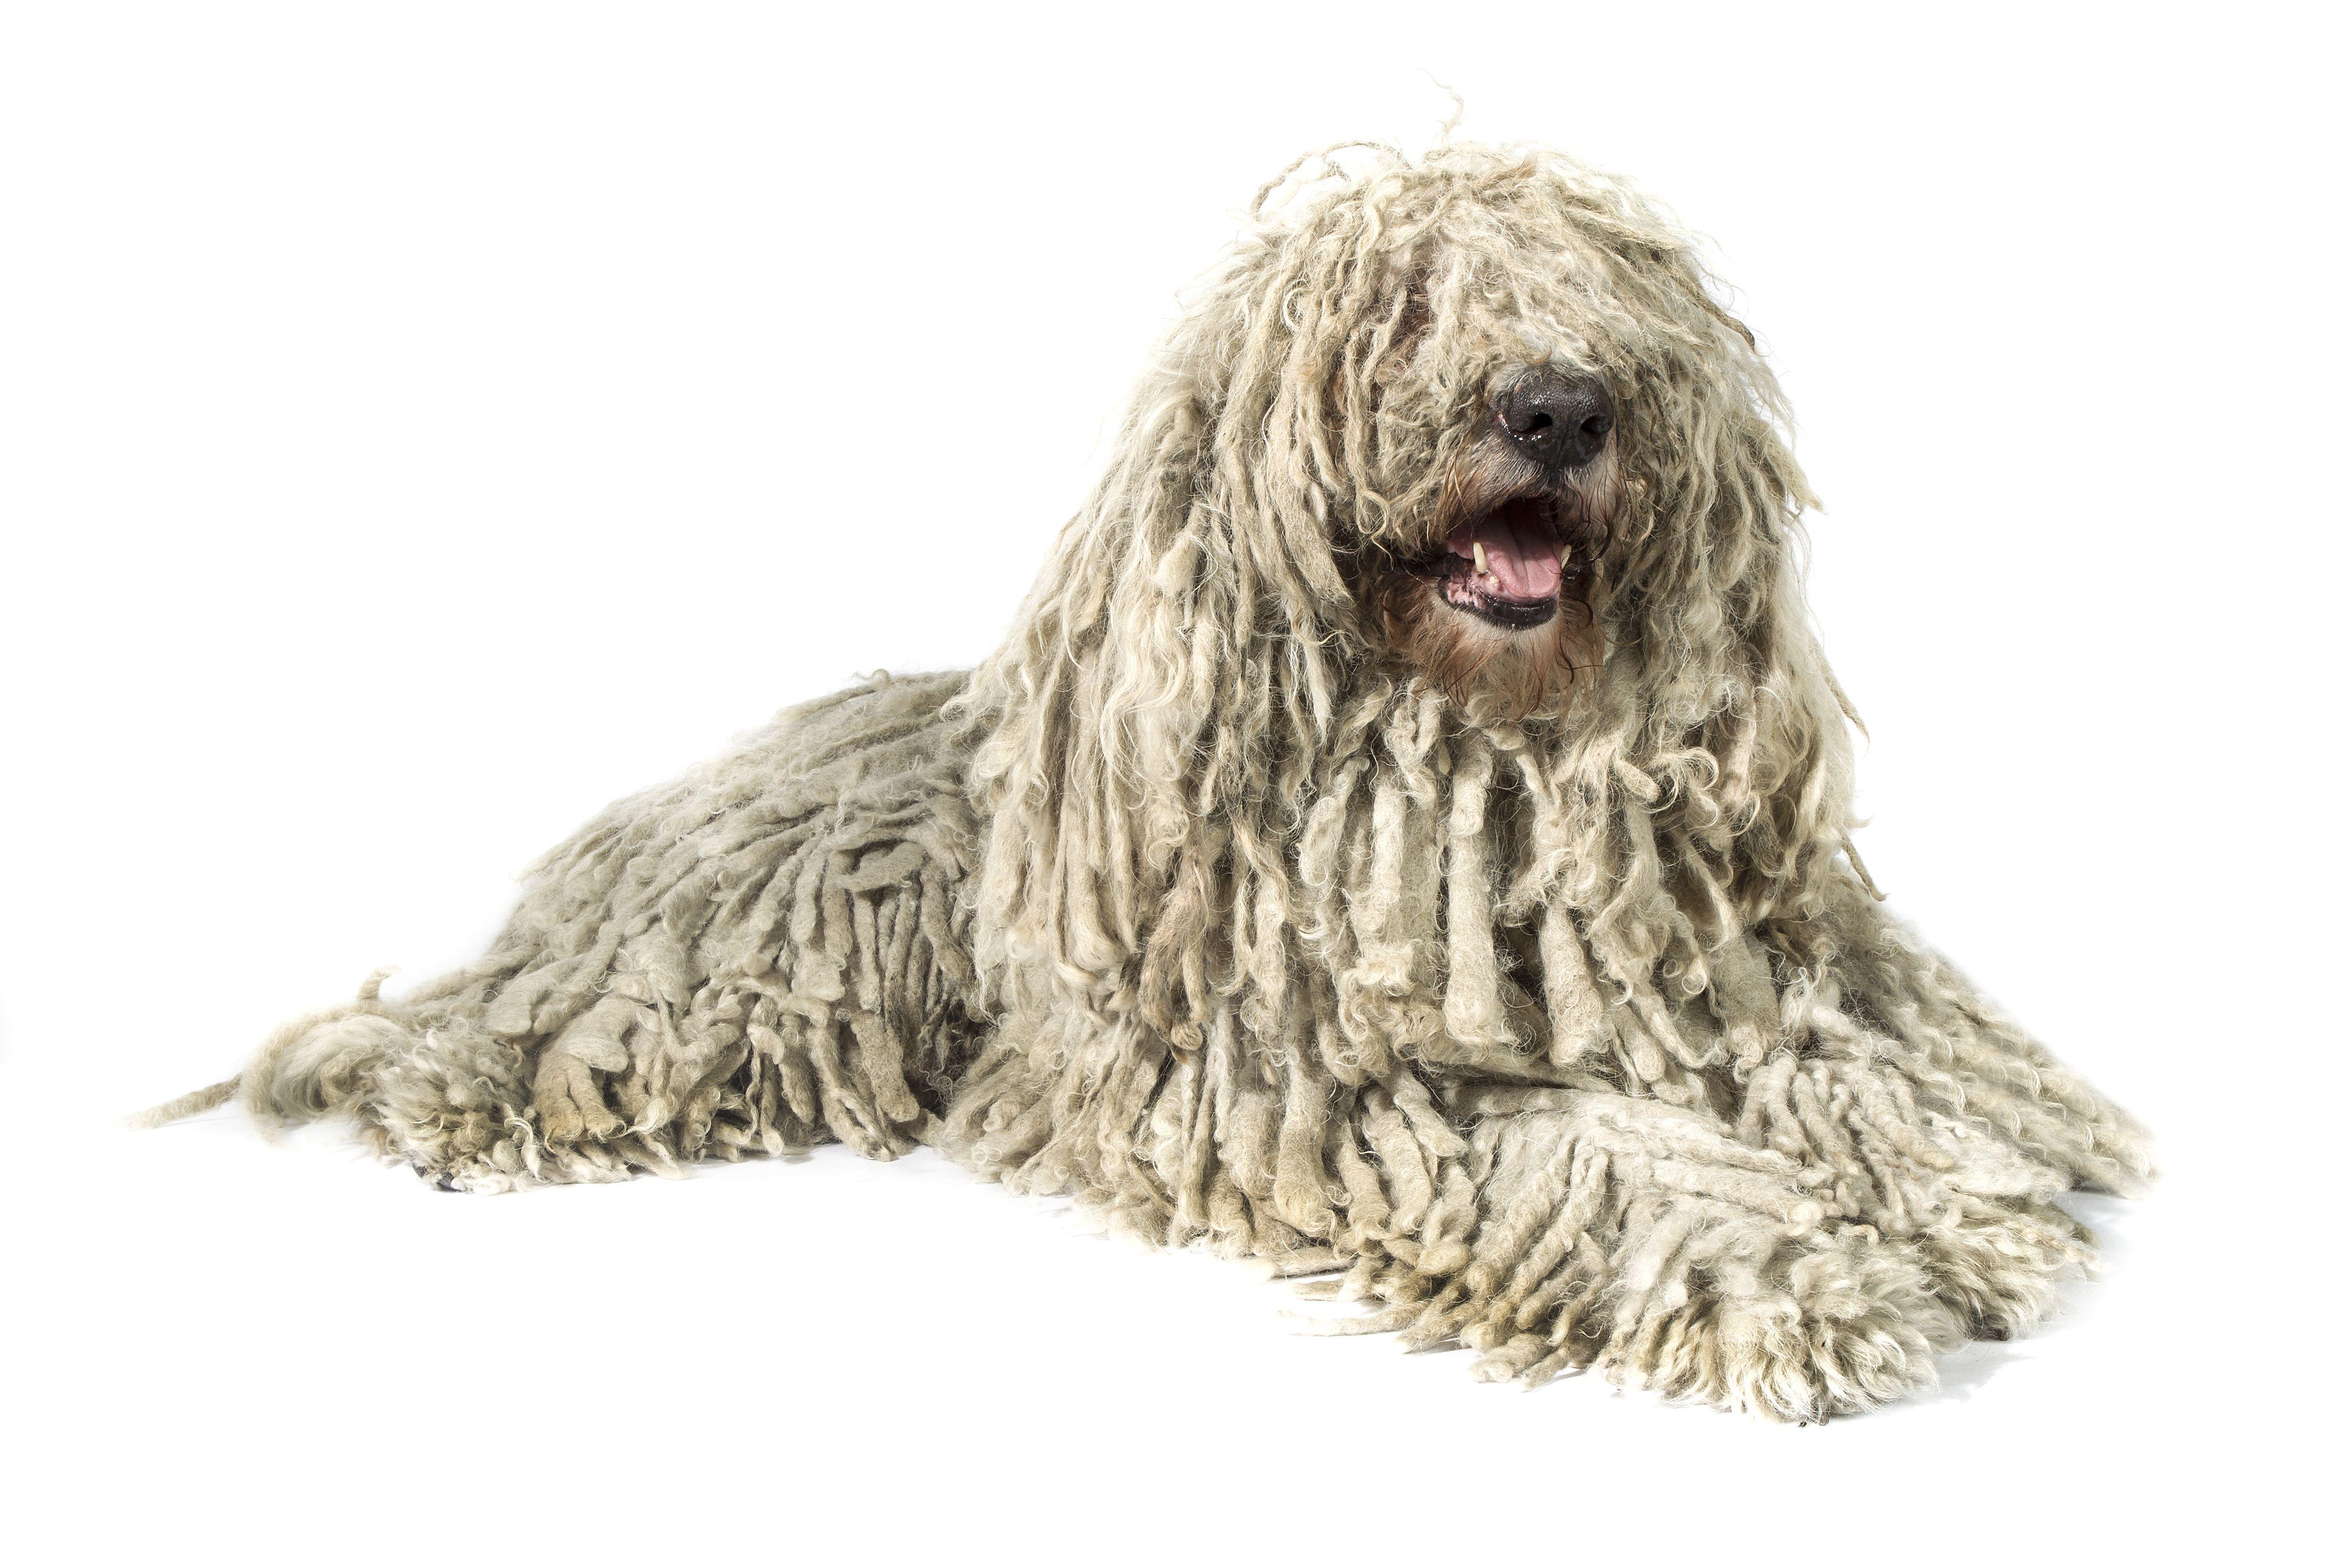 Komondor dog with white hair